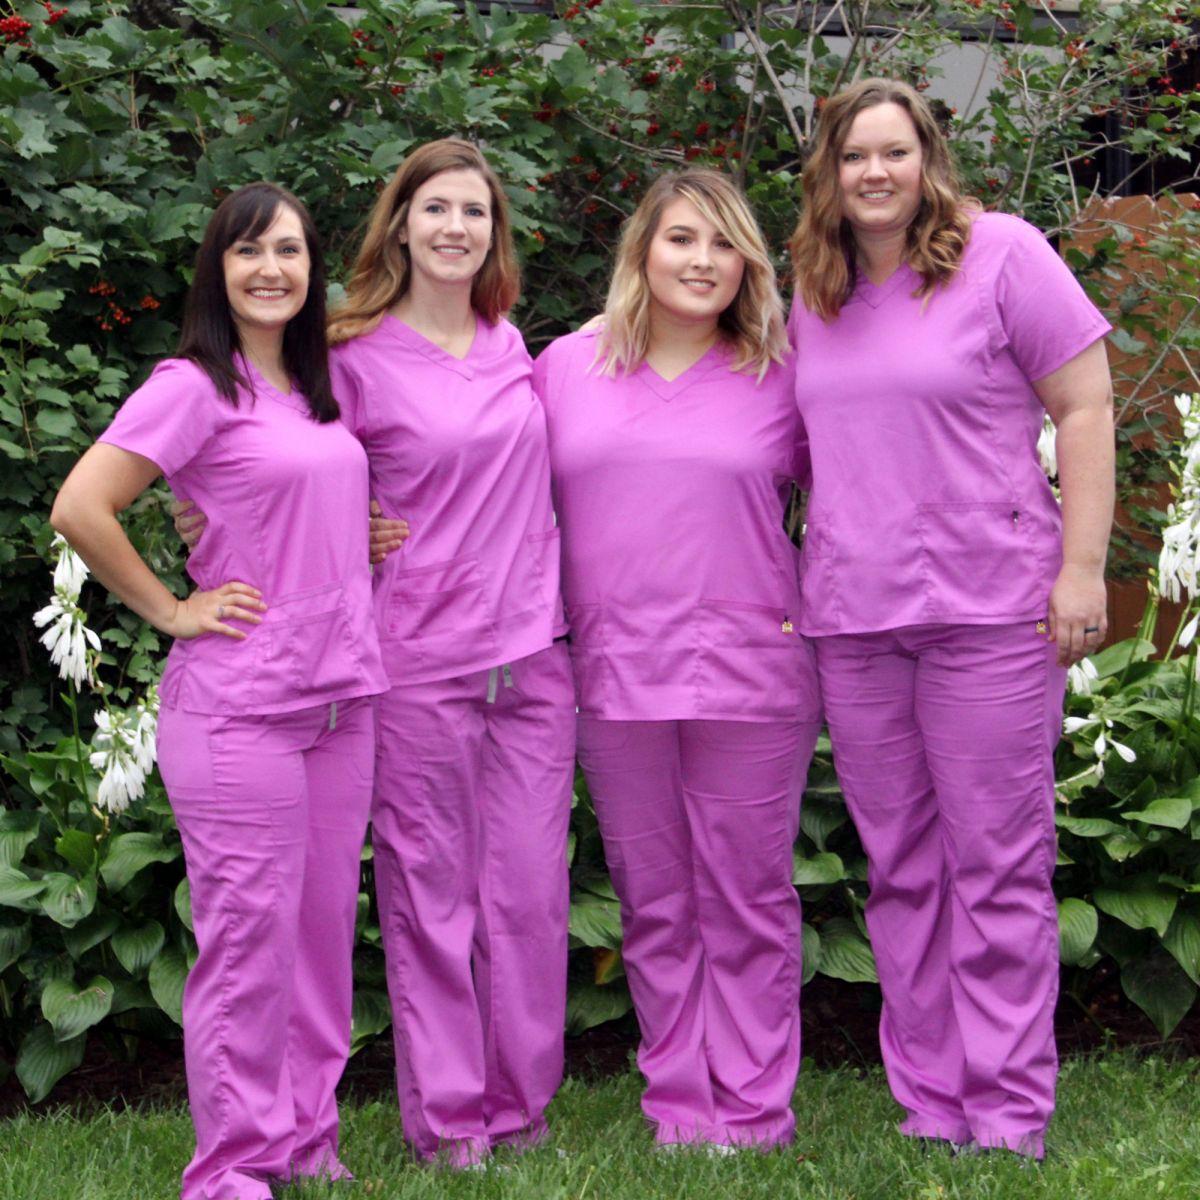 Meet your dream team nia jones orthodontics omaha nebraska city ne back girls m4hsunfo